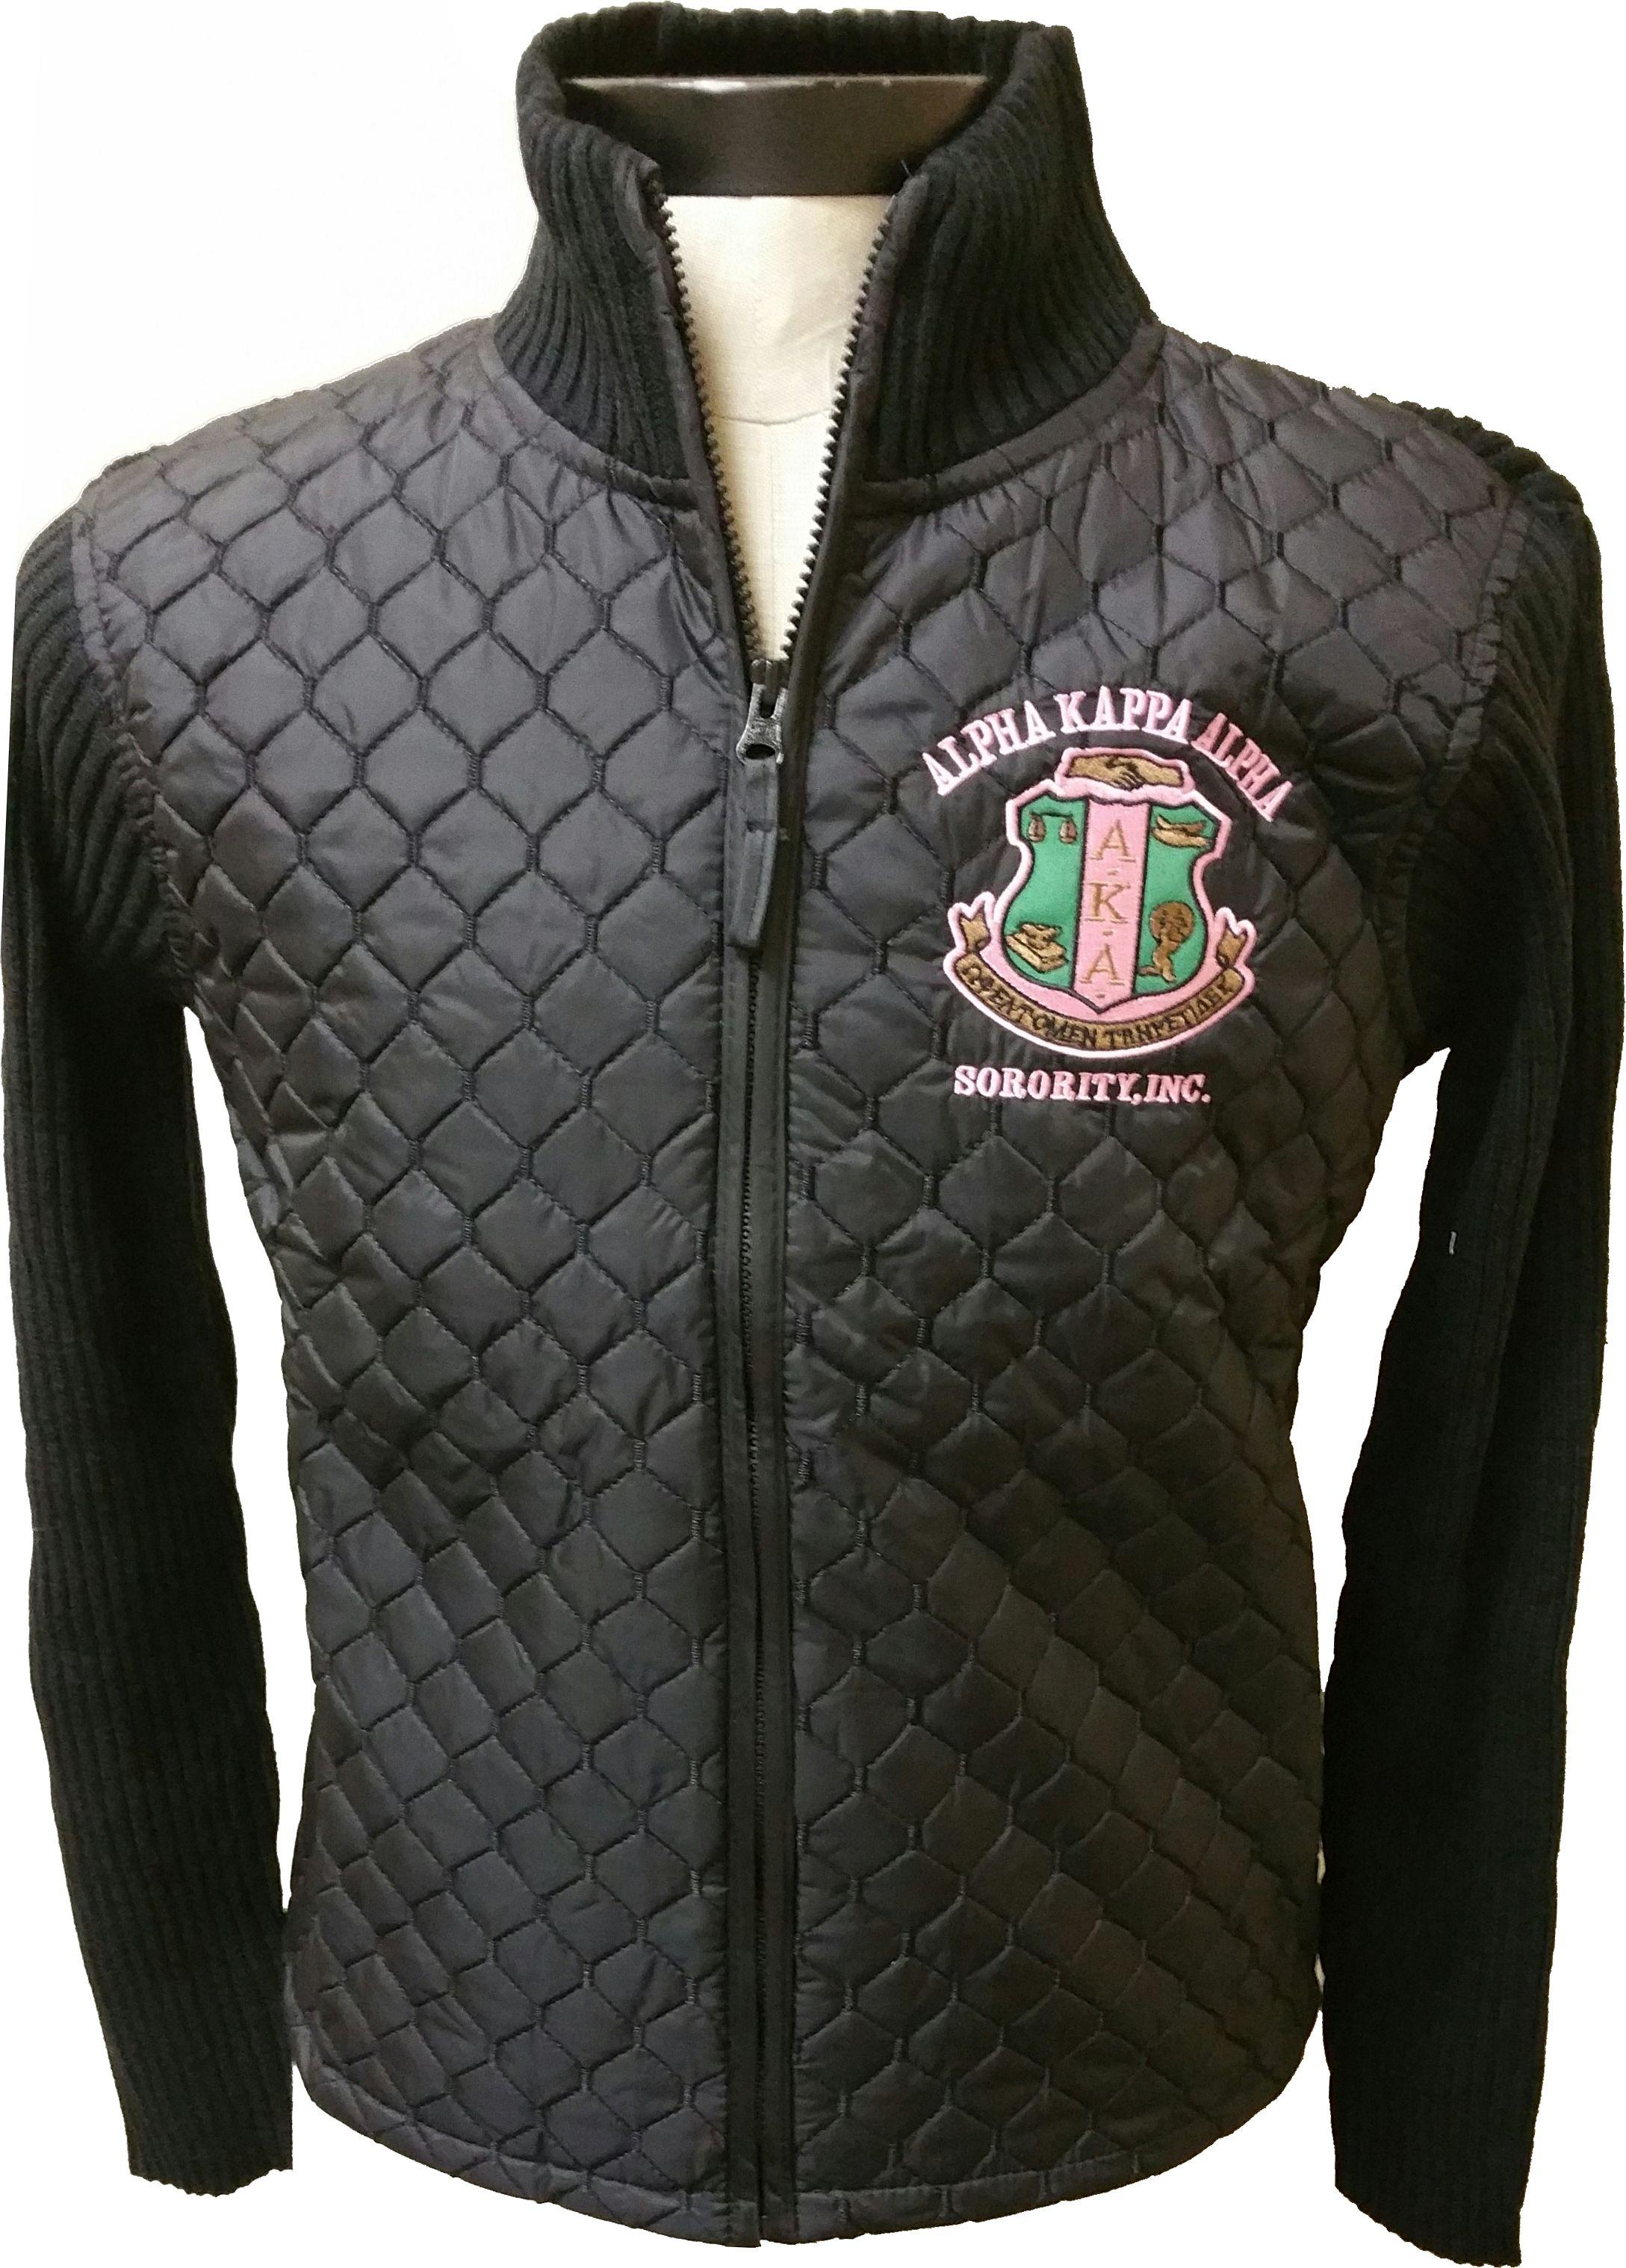 b5d05e337 Buffalo Dallas Alpha Kappa Alpha Ladies Sweater Jacket in 2019 ...